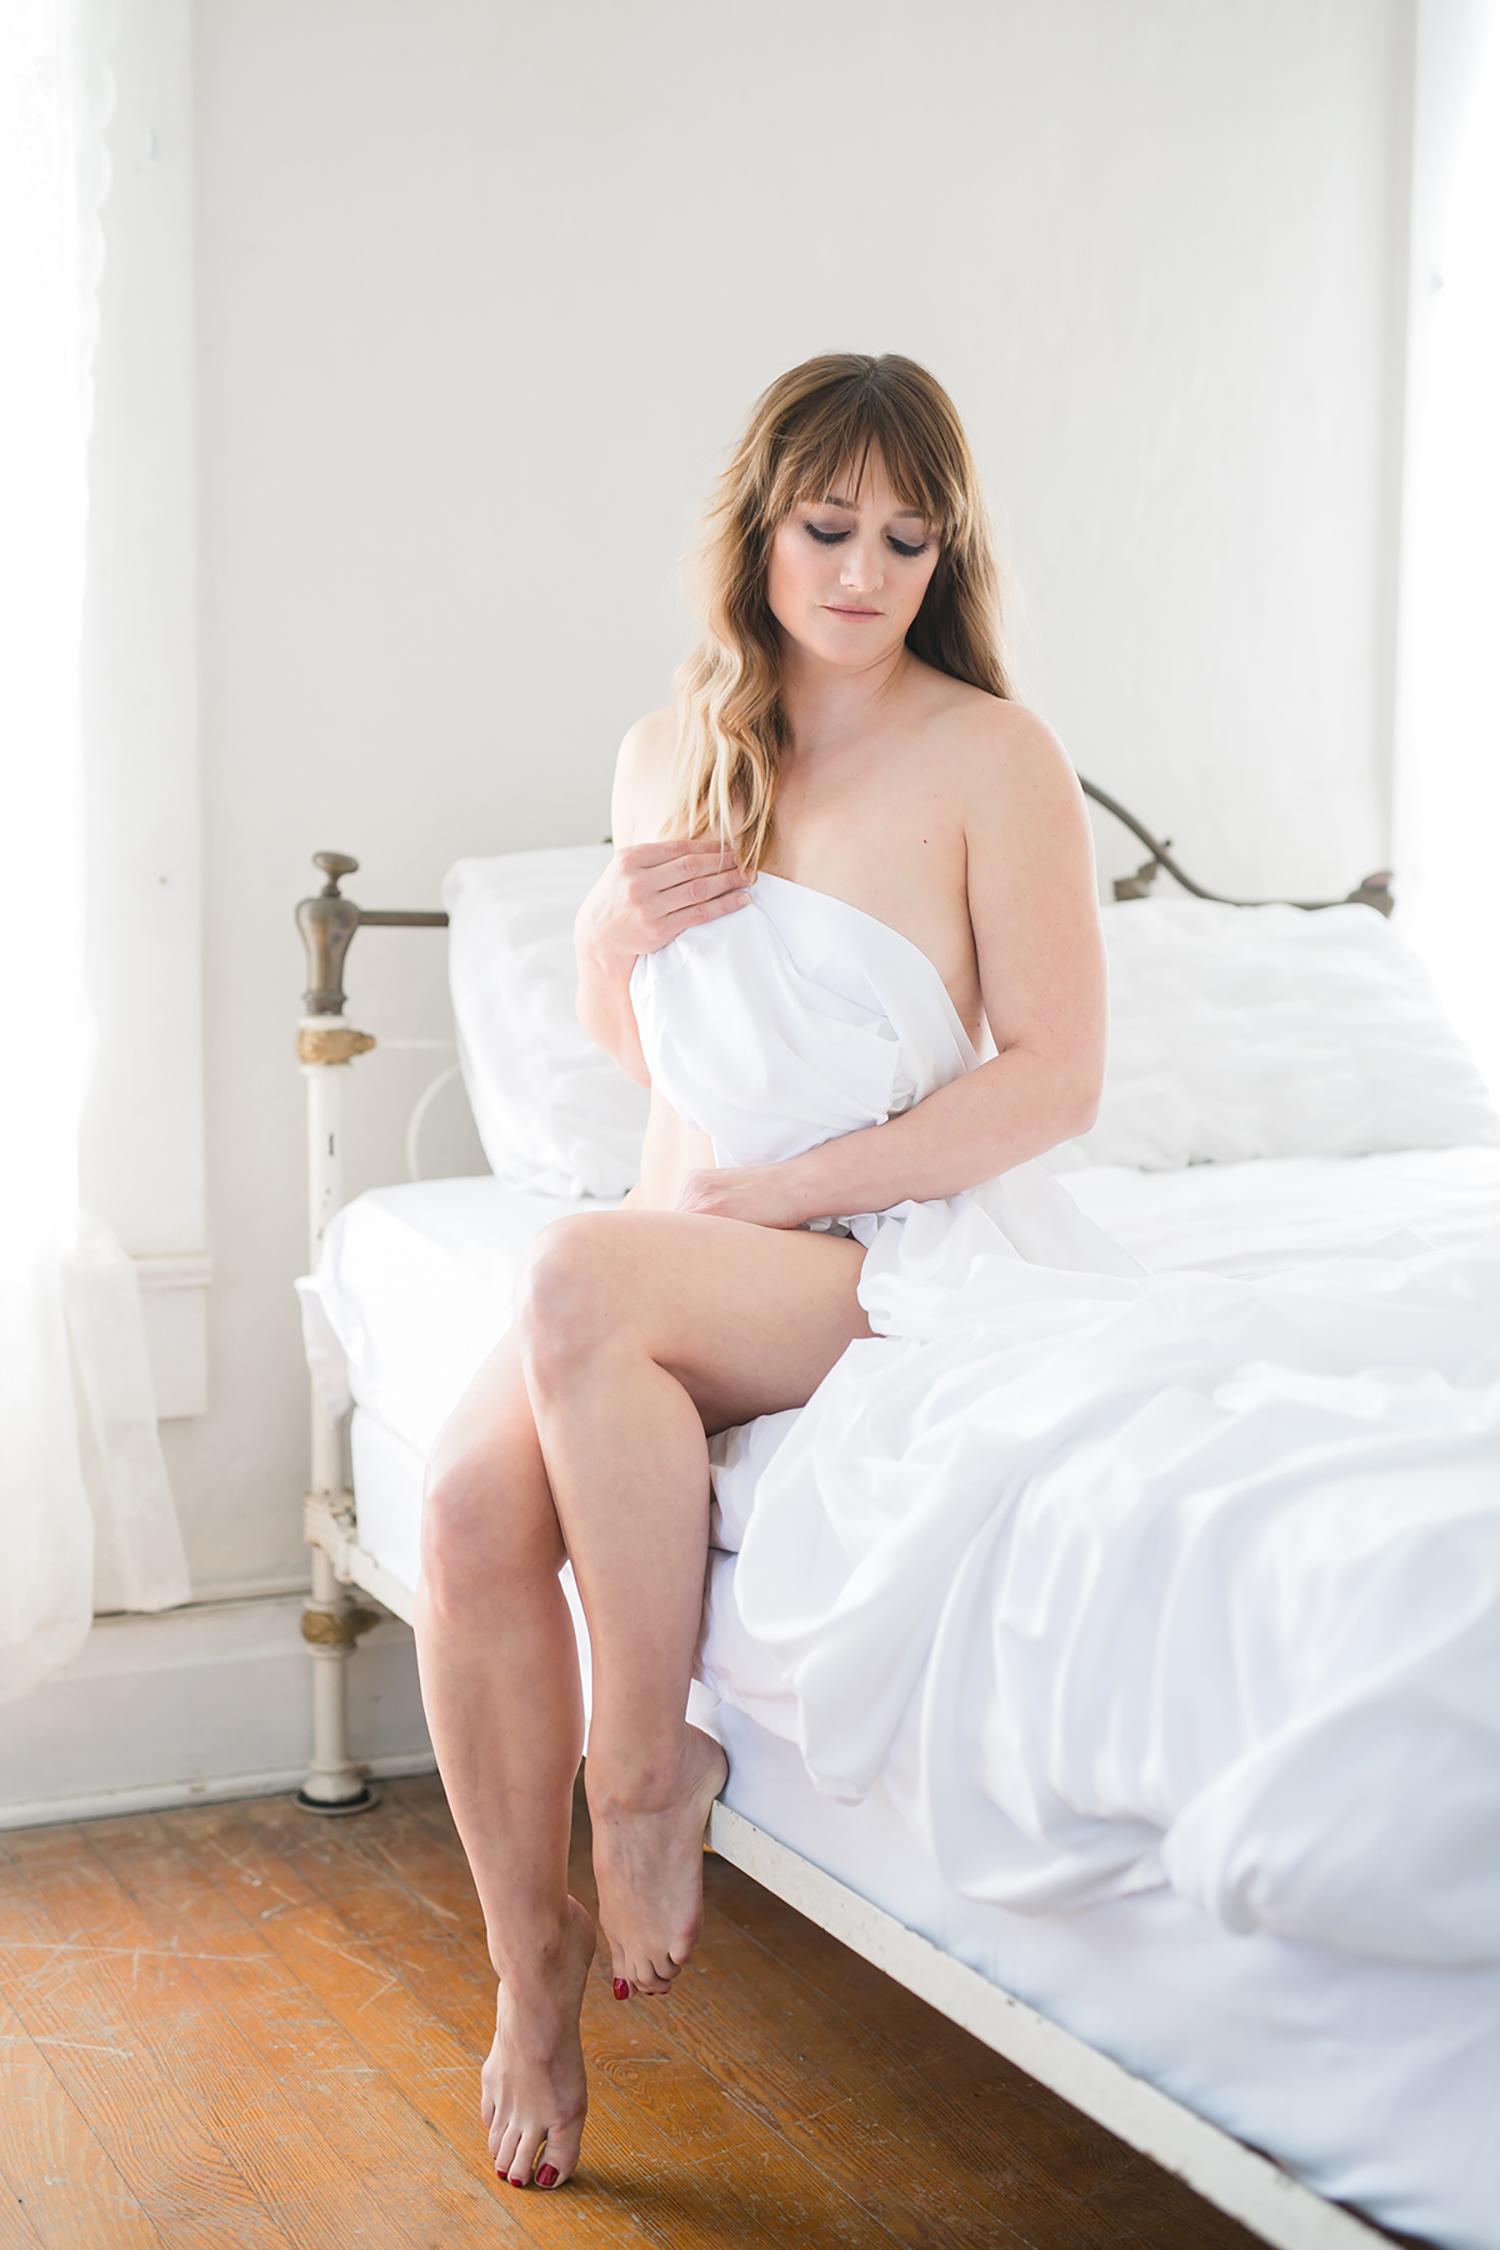 austin-atx-boudoir-artistic-nudes--kbb26.jpg